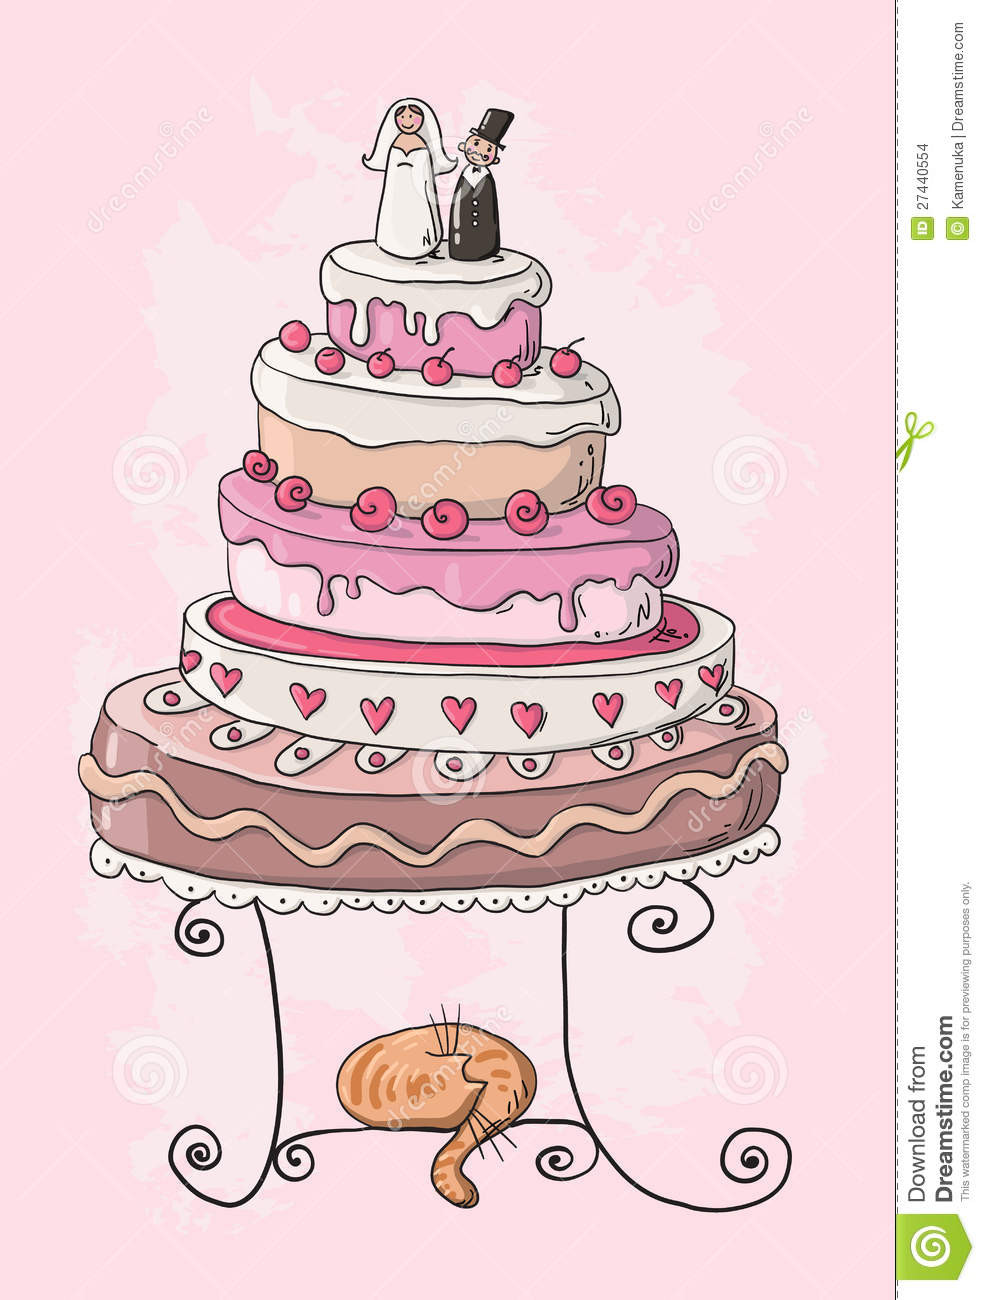 Cartoon Wedding Cakes  Wedding Cake Cartoon Stock Image